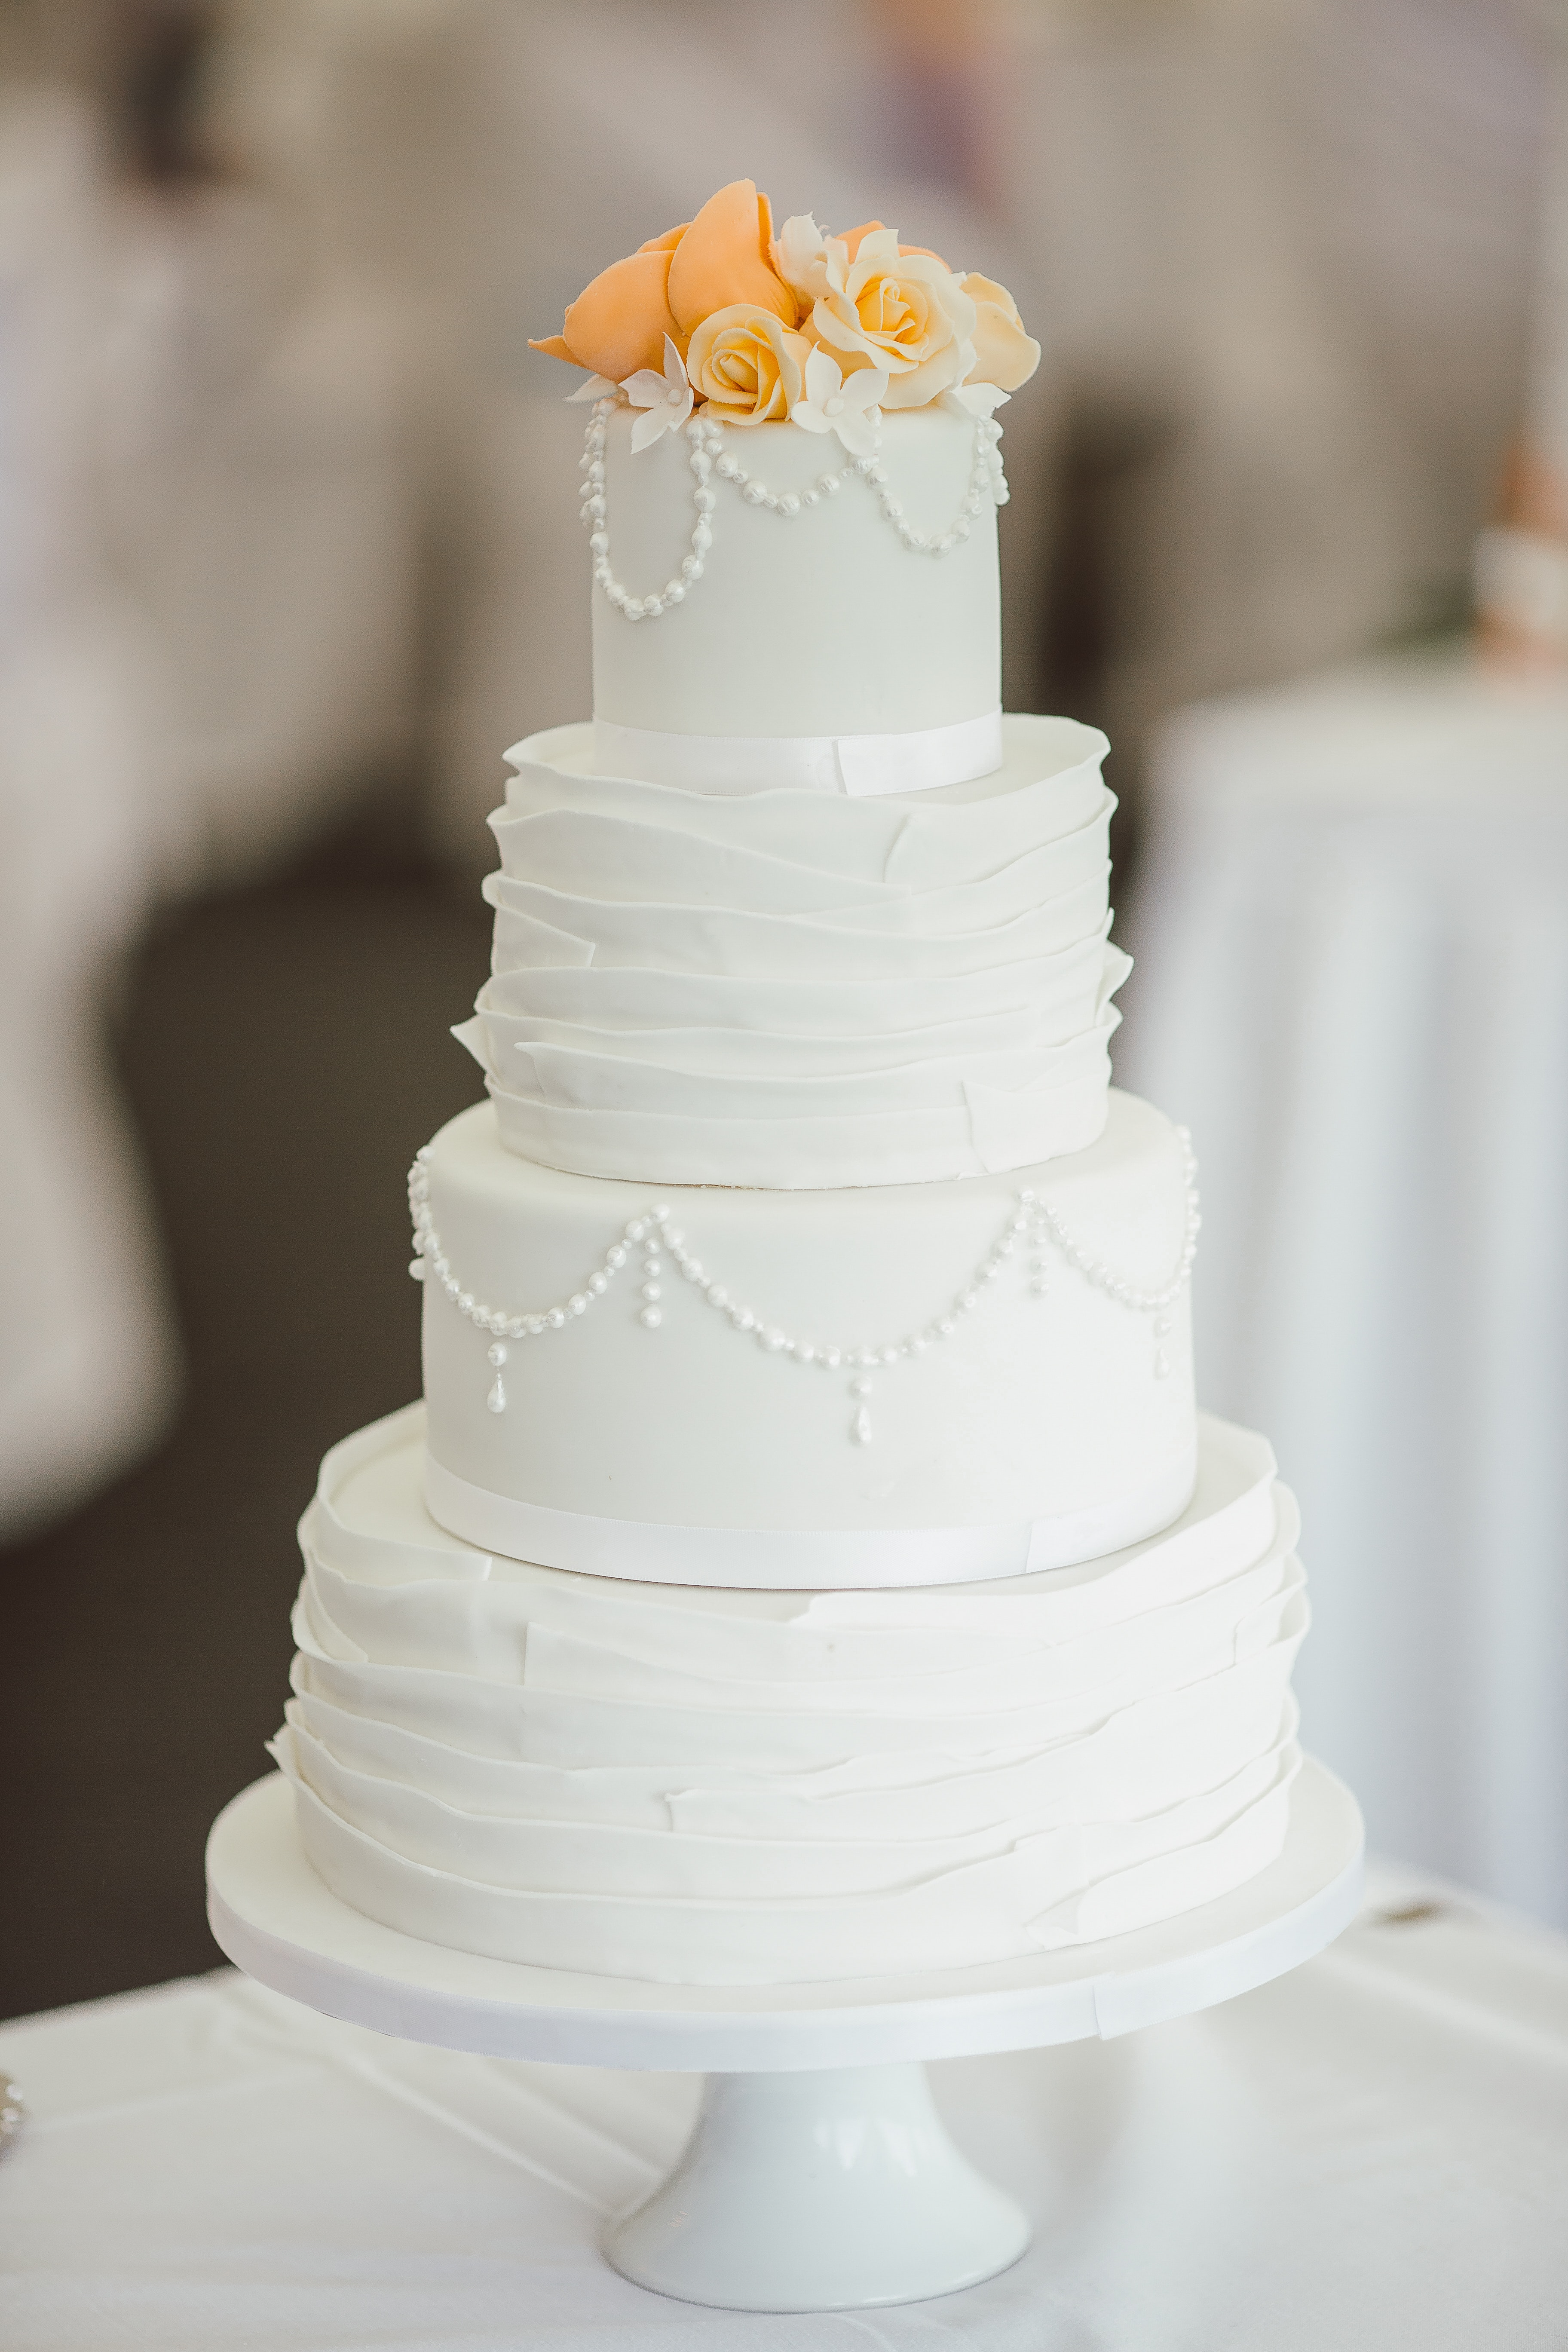 Wedding cake number 2